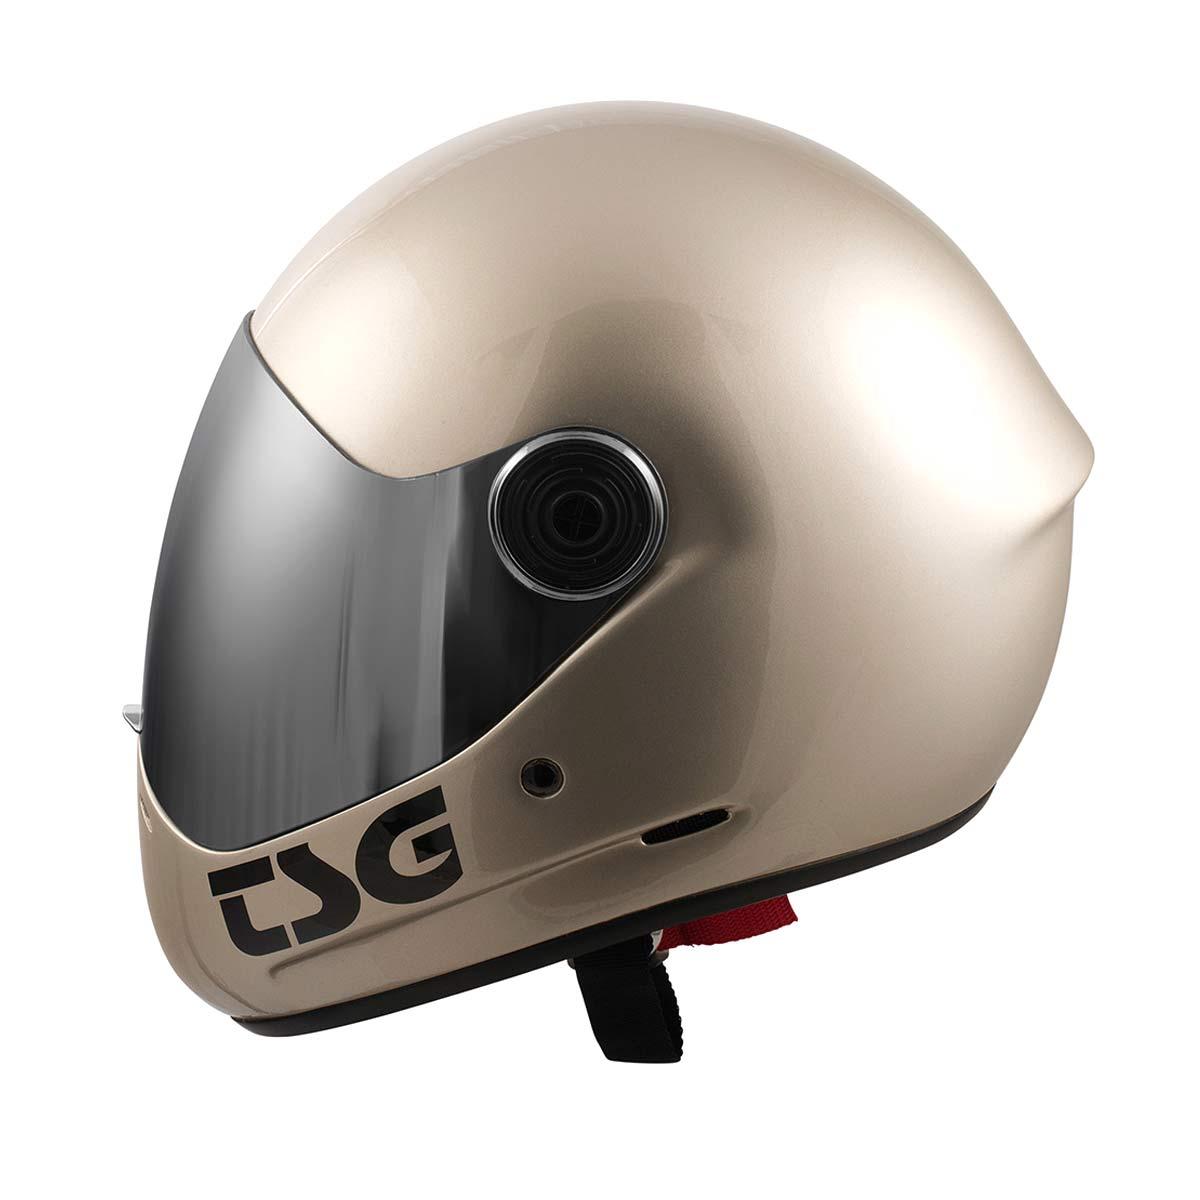 Buy TSG Pass Pro Full Face Helmet Plateado + Bonus Visor Canada Online Sales Vancouver Pickup